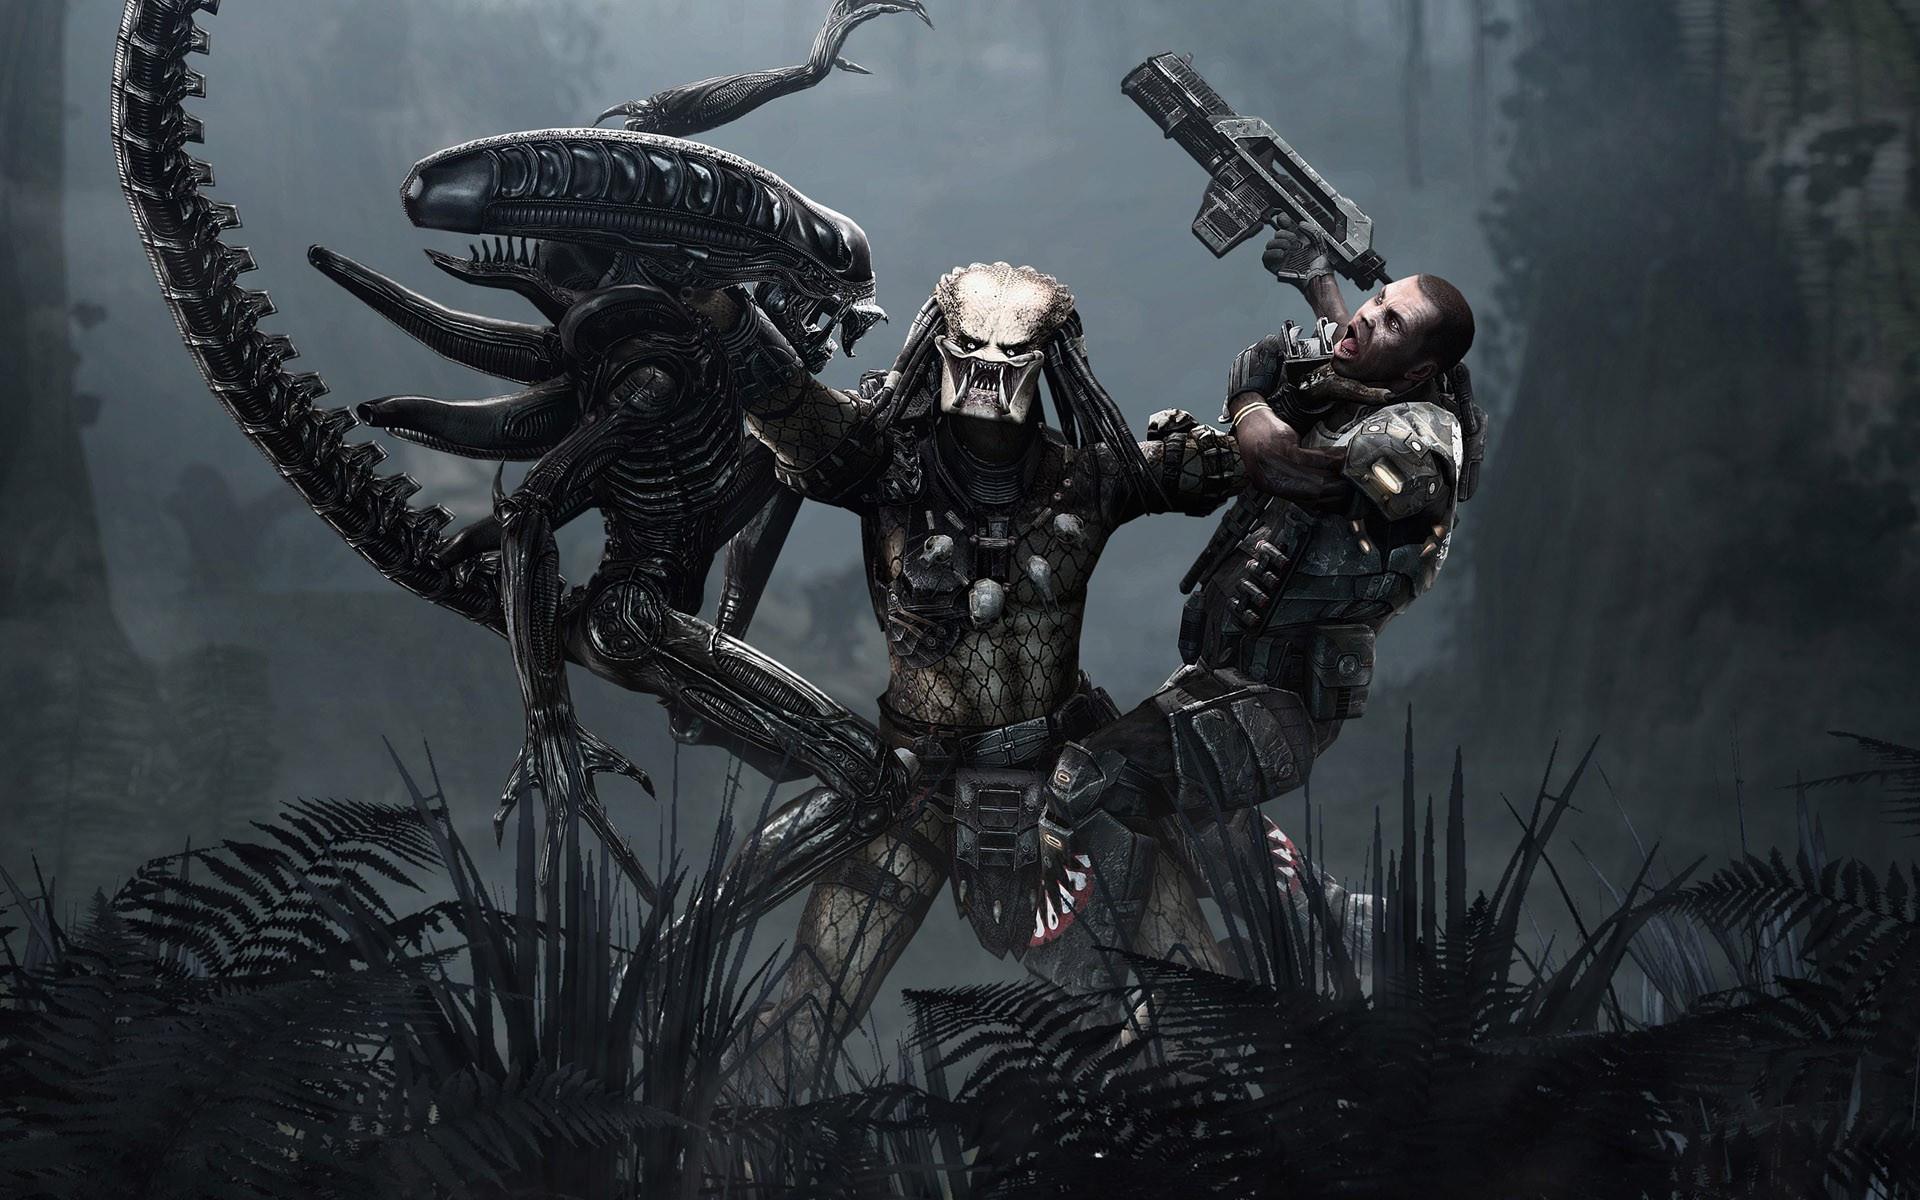 1920x1200 > Alien Vs. Predator Wallpapers